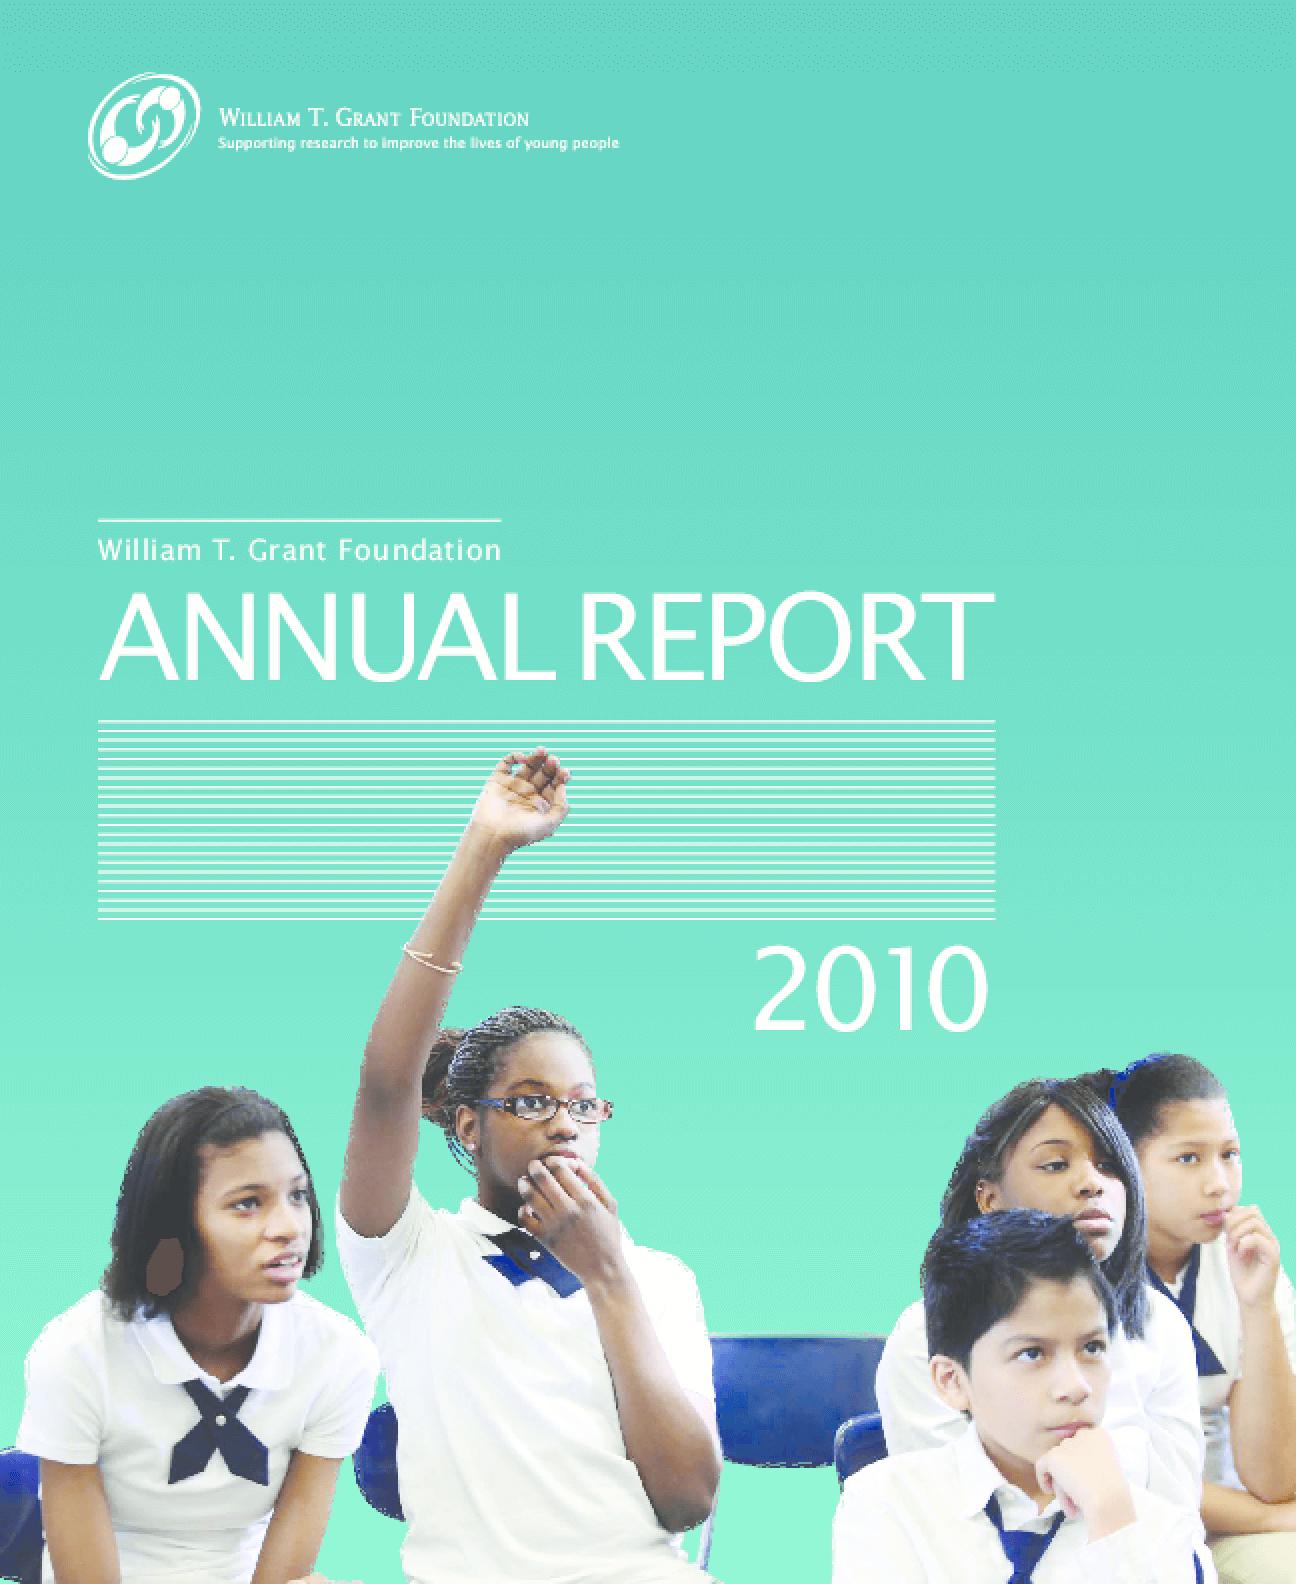 William T. Grant Foundation 2010 Annual Report